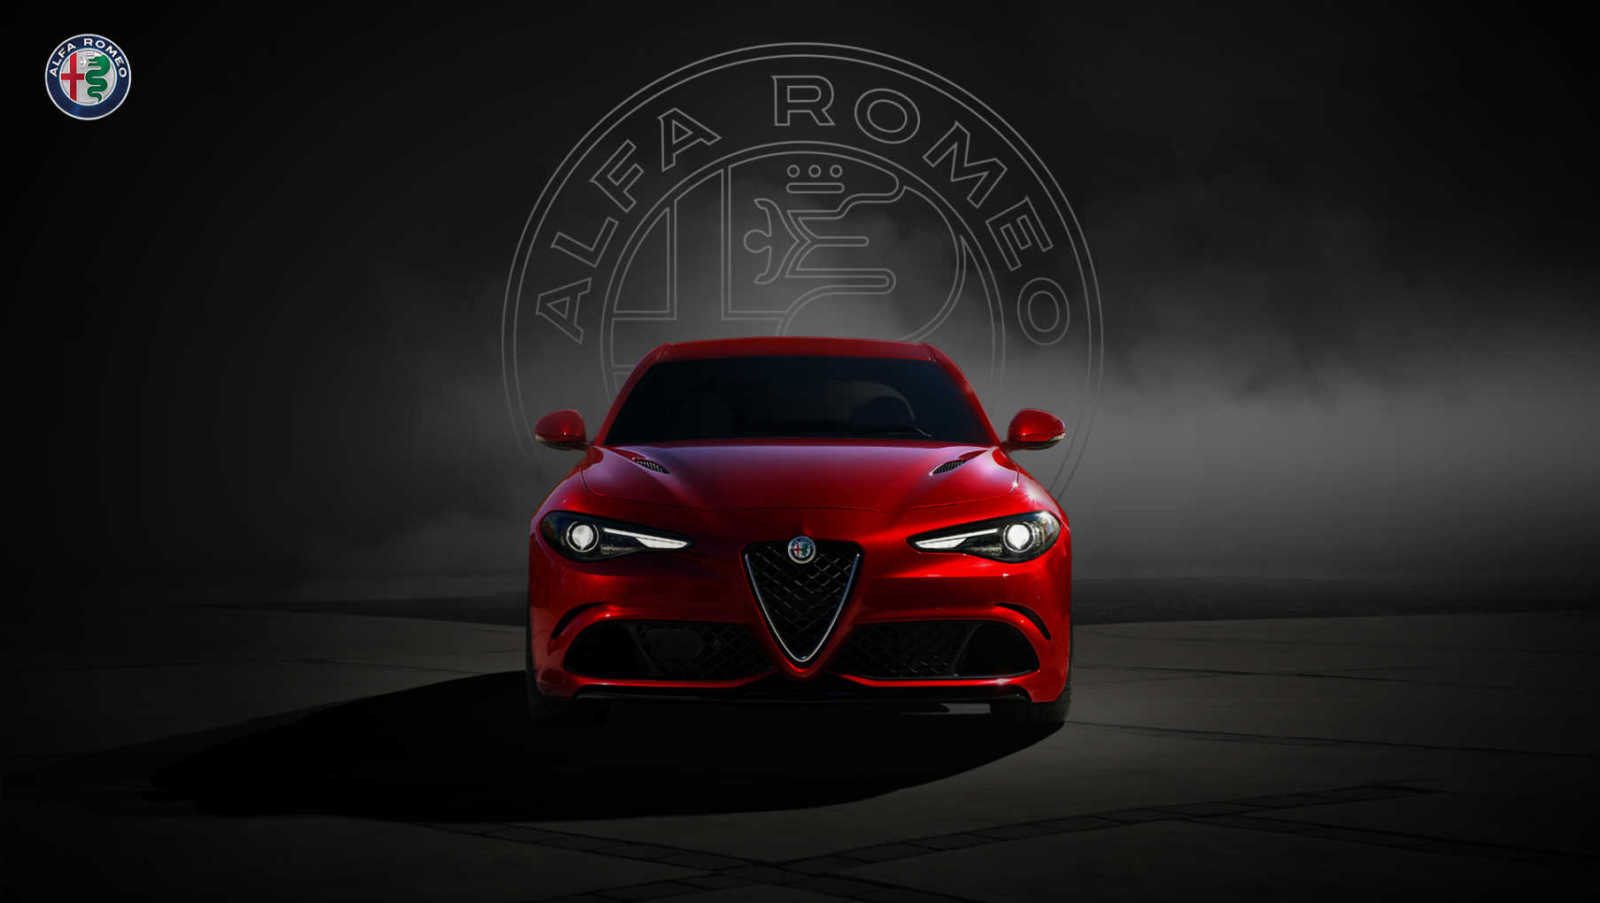 Alfa_Romeo_Giulia_Desk